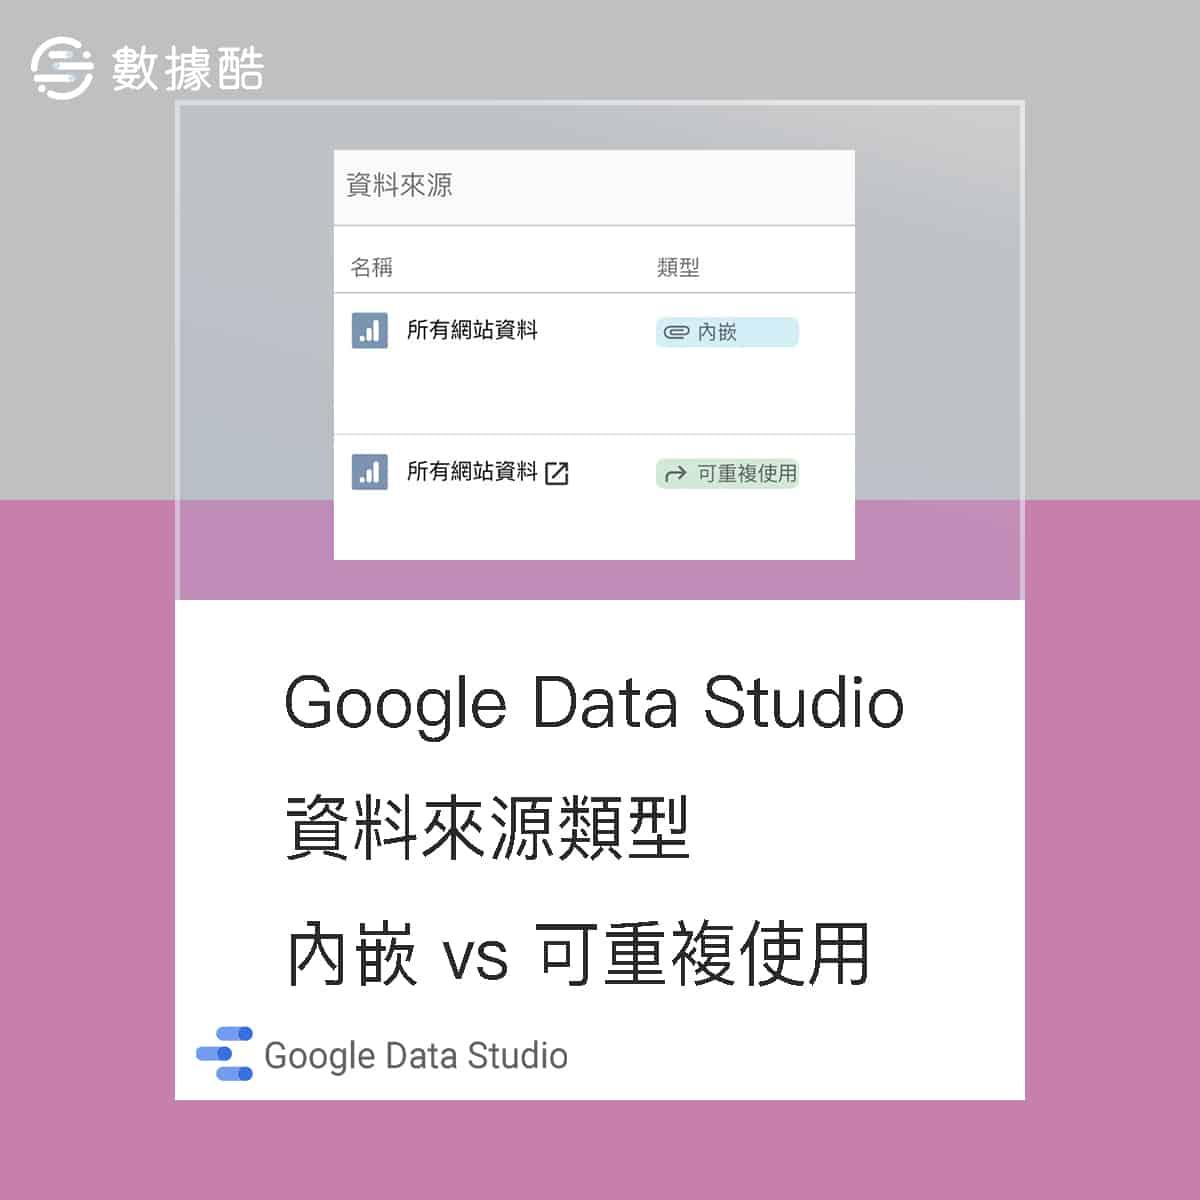 Google Data Studio 資料來源類型 內嵌 vs 可重複使用